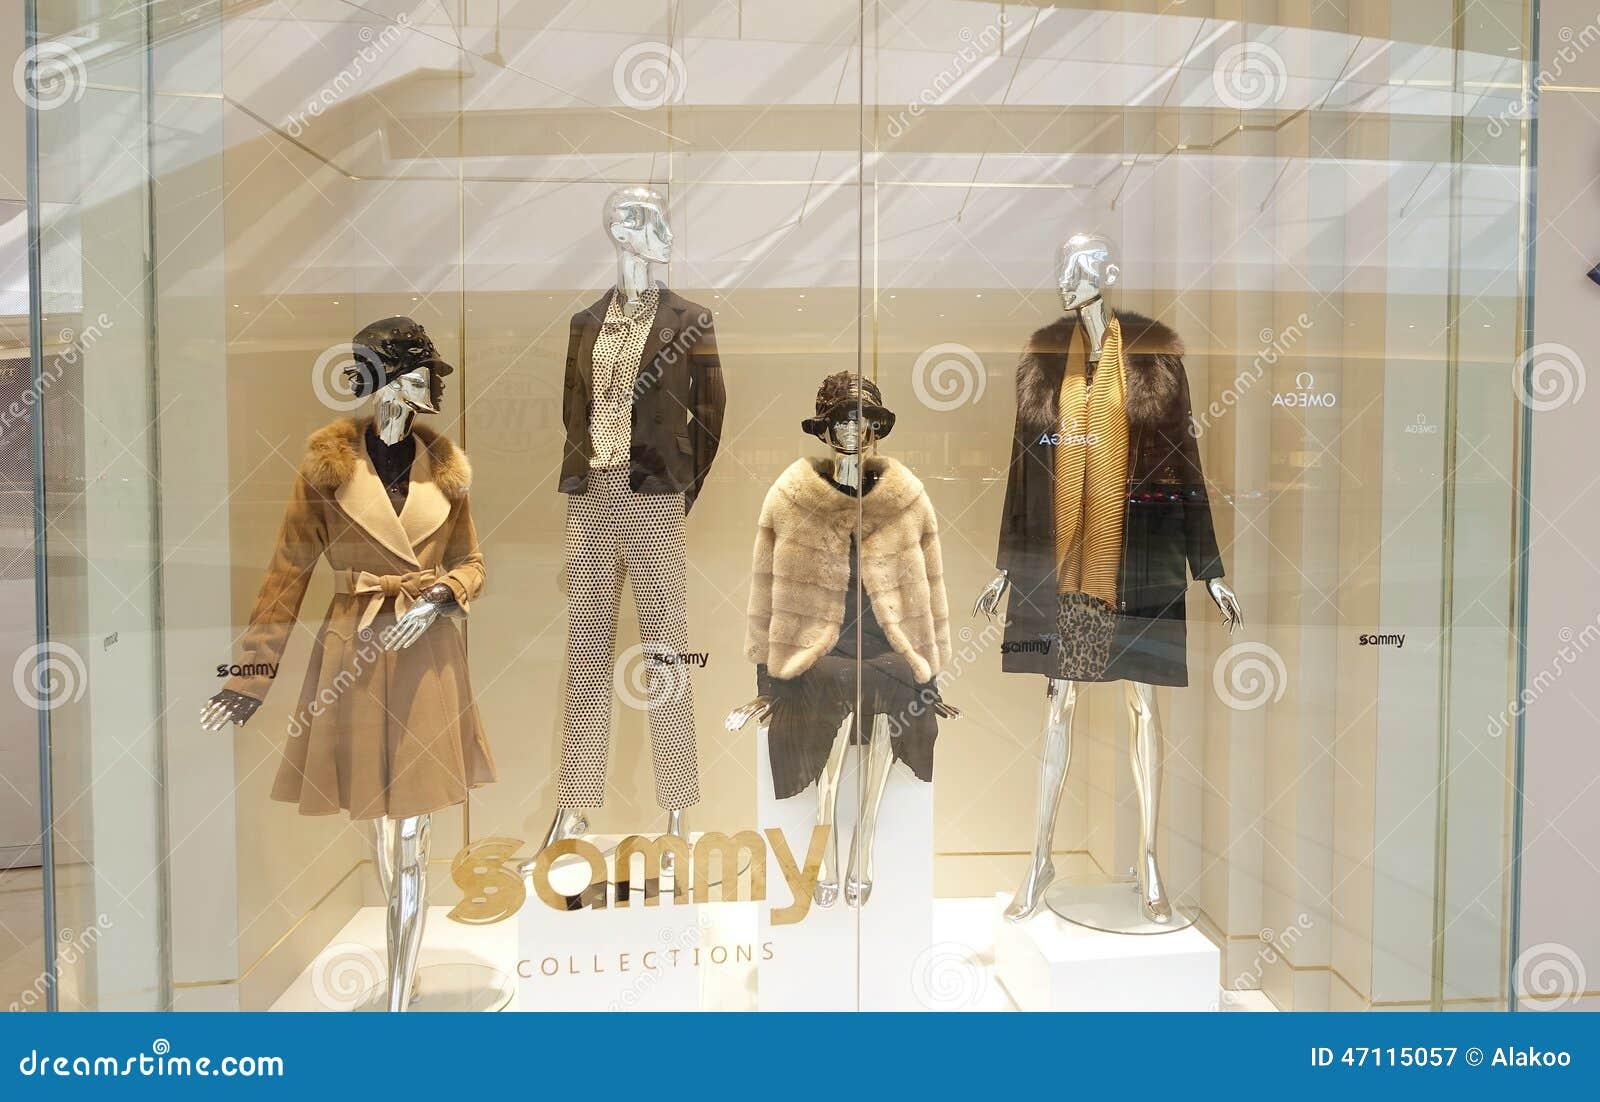 58b2c6dc30f64 Fashion Boutique Clothing Shop Window Dress Store Editorial ...